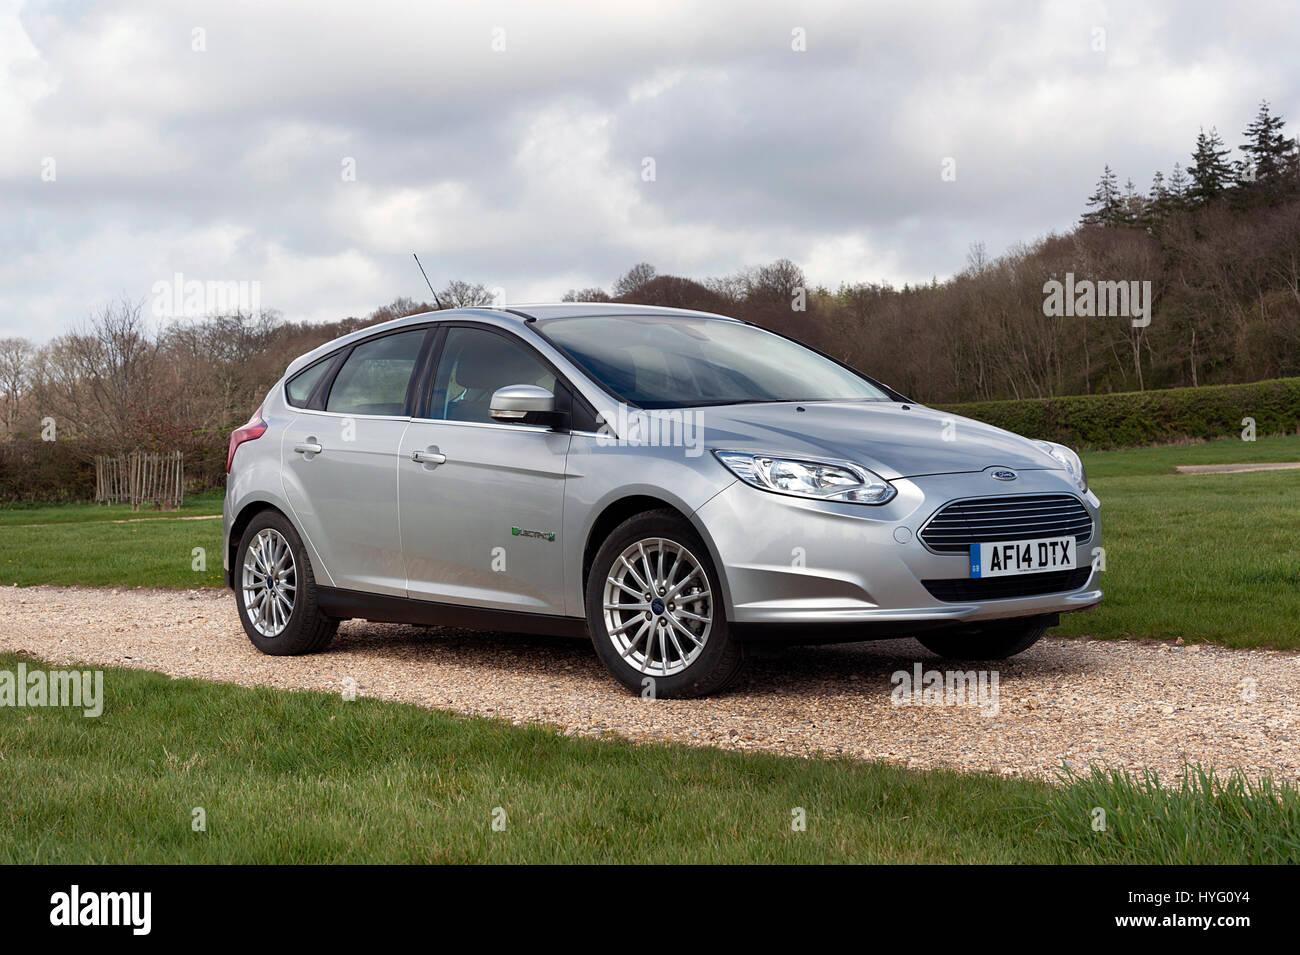 2014 Ford Focus coche eléctrico Imagen De Stock